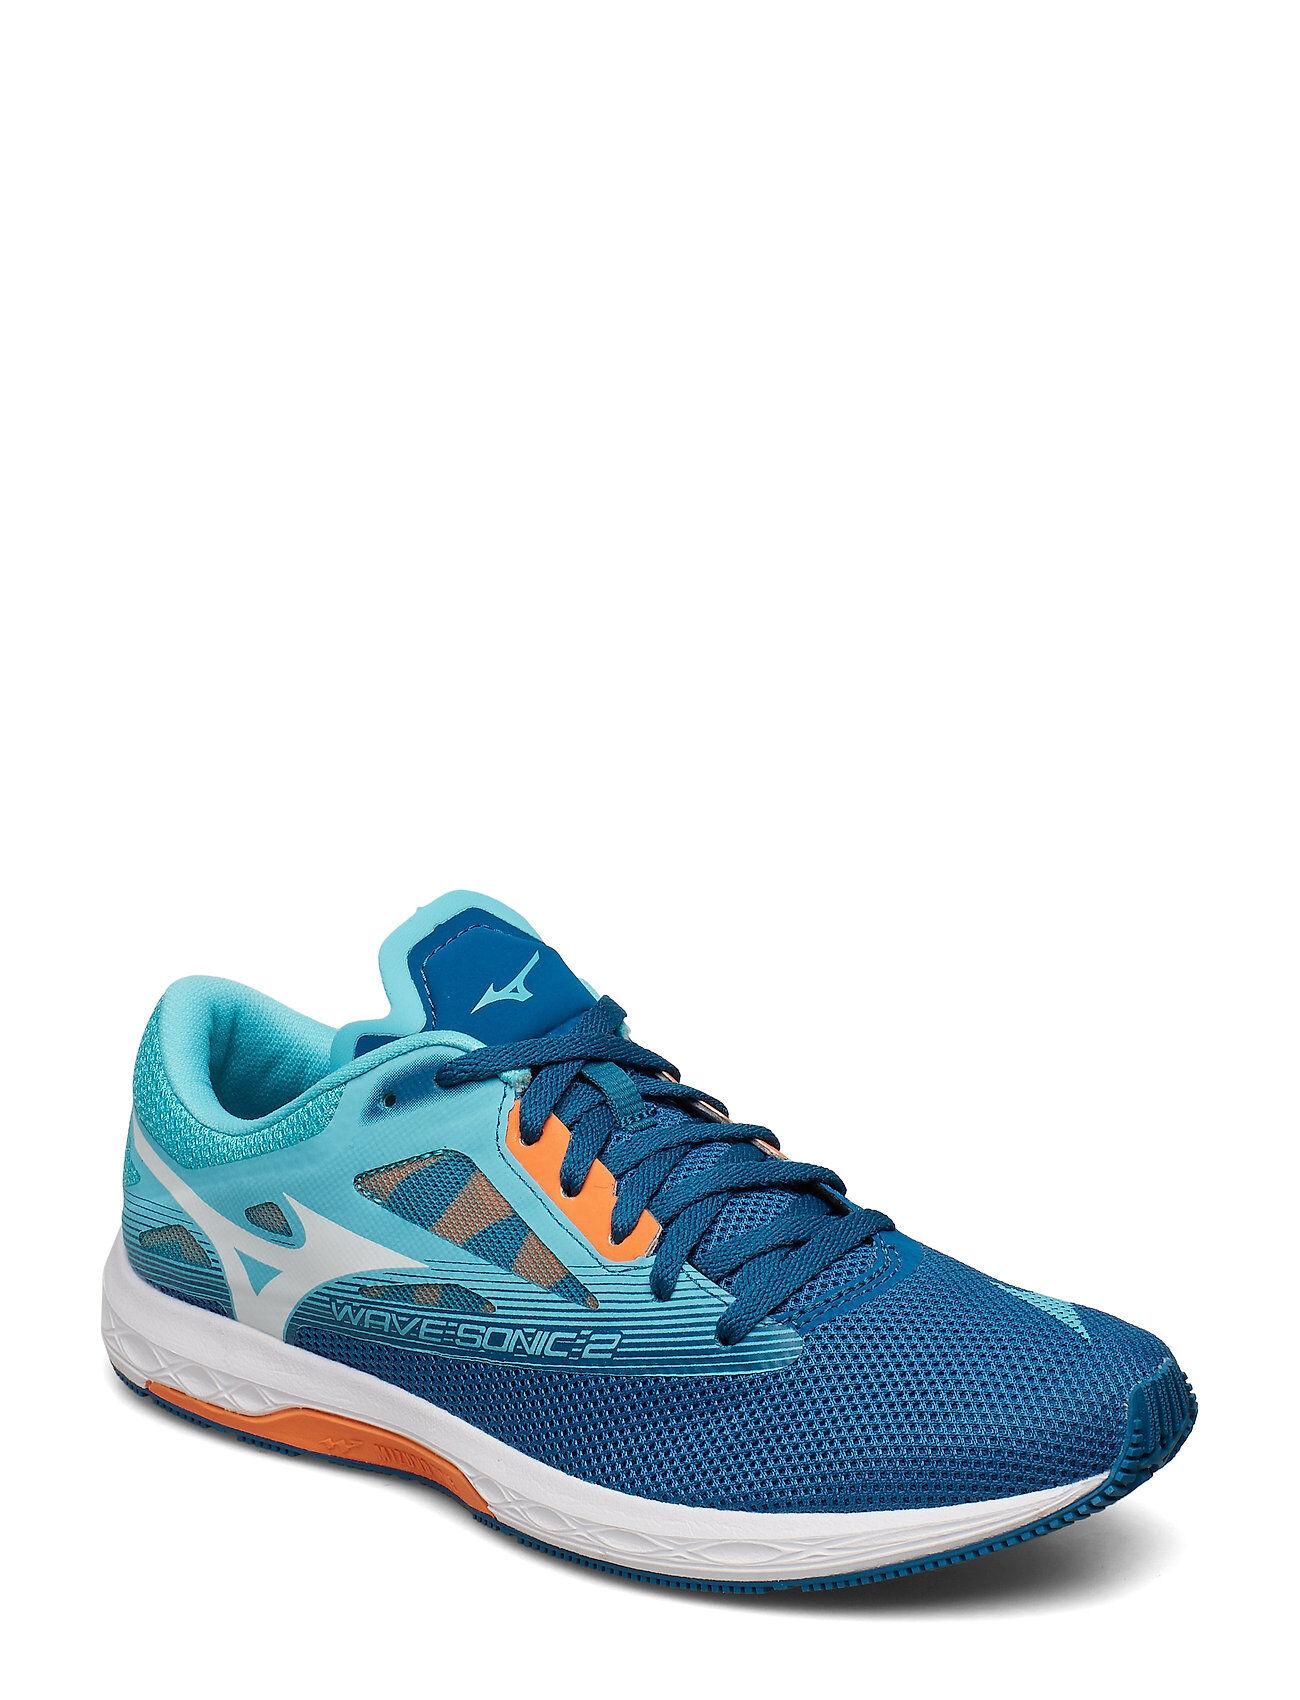 Mizuno Wave Sonic 2 Shoes Sport Shoes Running Shoes Sininen